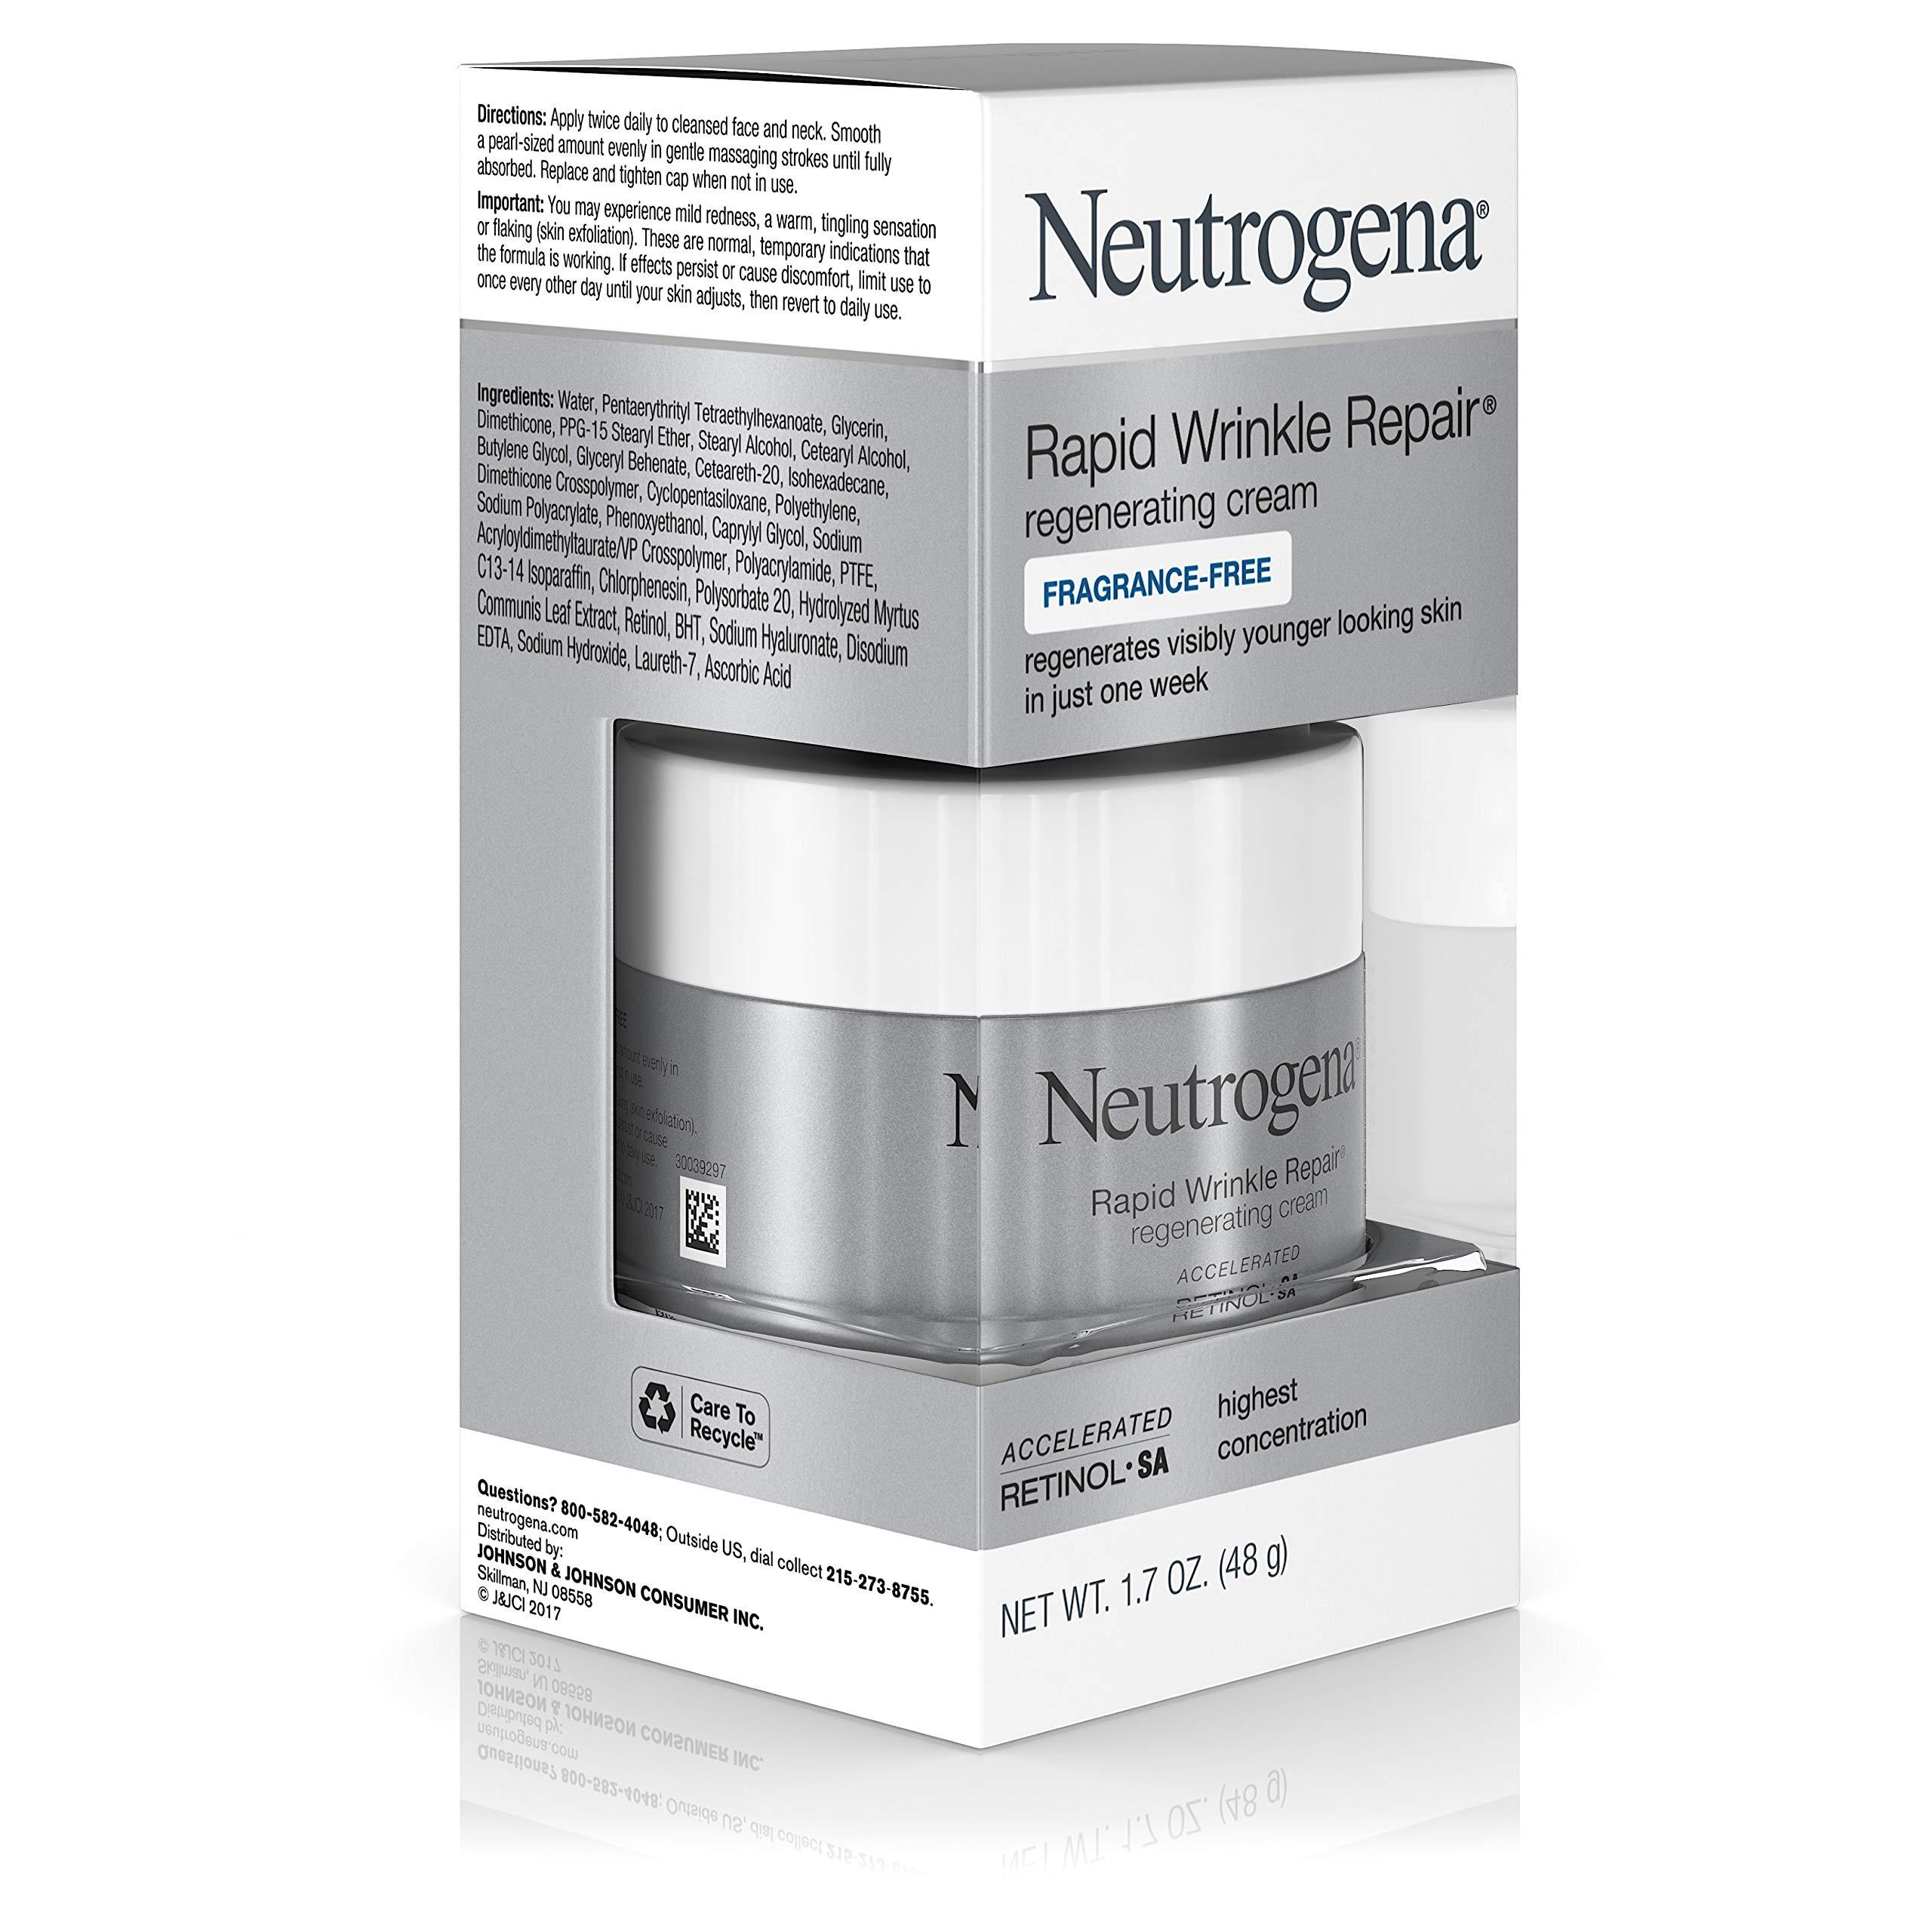 Neutrogena Rapid Wrinkle Repair Hyaluronic Acid Retinol Cream, Anti Wrinkle Cream, Face Moisturizer, Neck Cream & Dark Spot Remover for Face - Day & Night Cream with Hyaluronic Acid & Retinol, 1.7 oz by Neutrogena (Image #3)